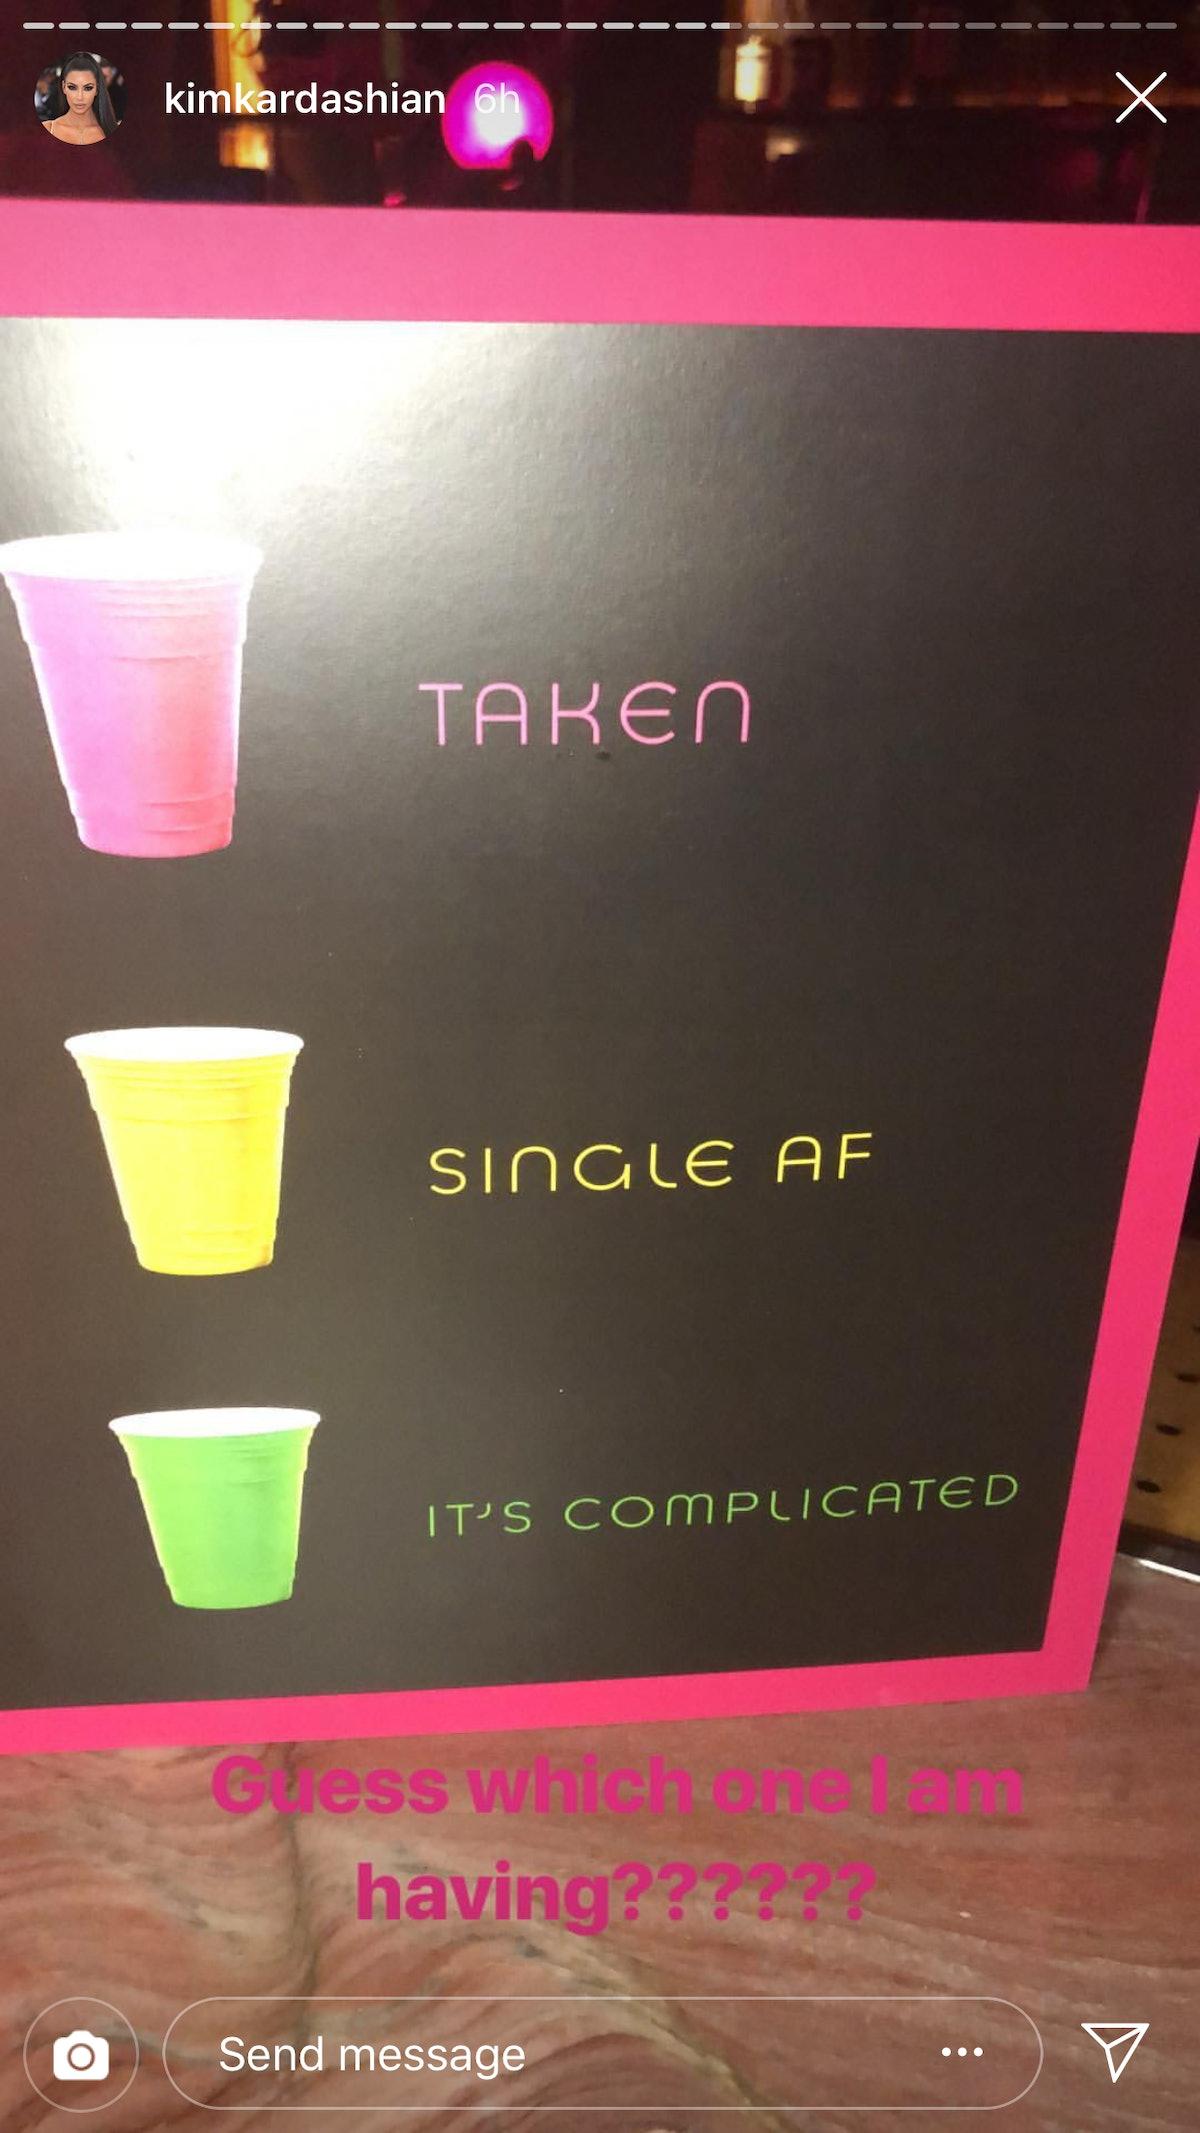 khloe kardashian it's complicated embed1